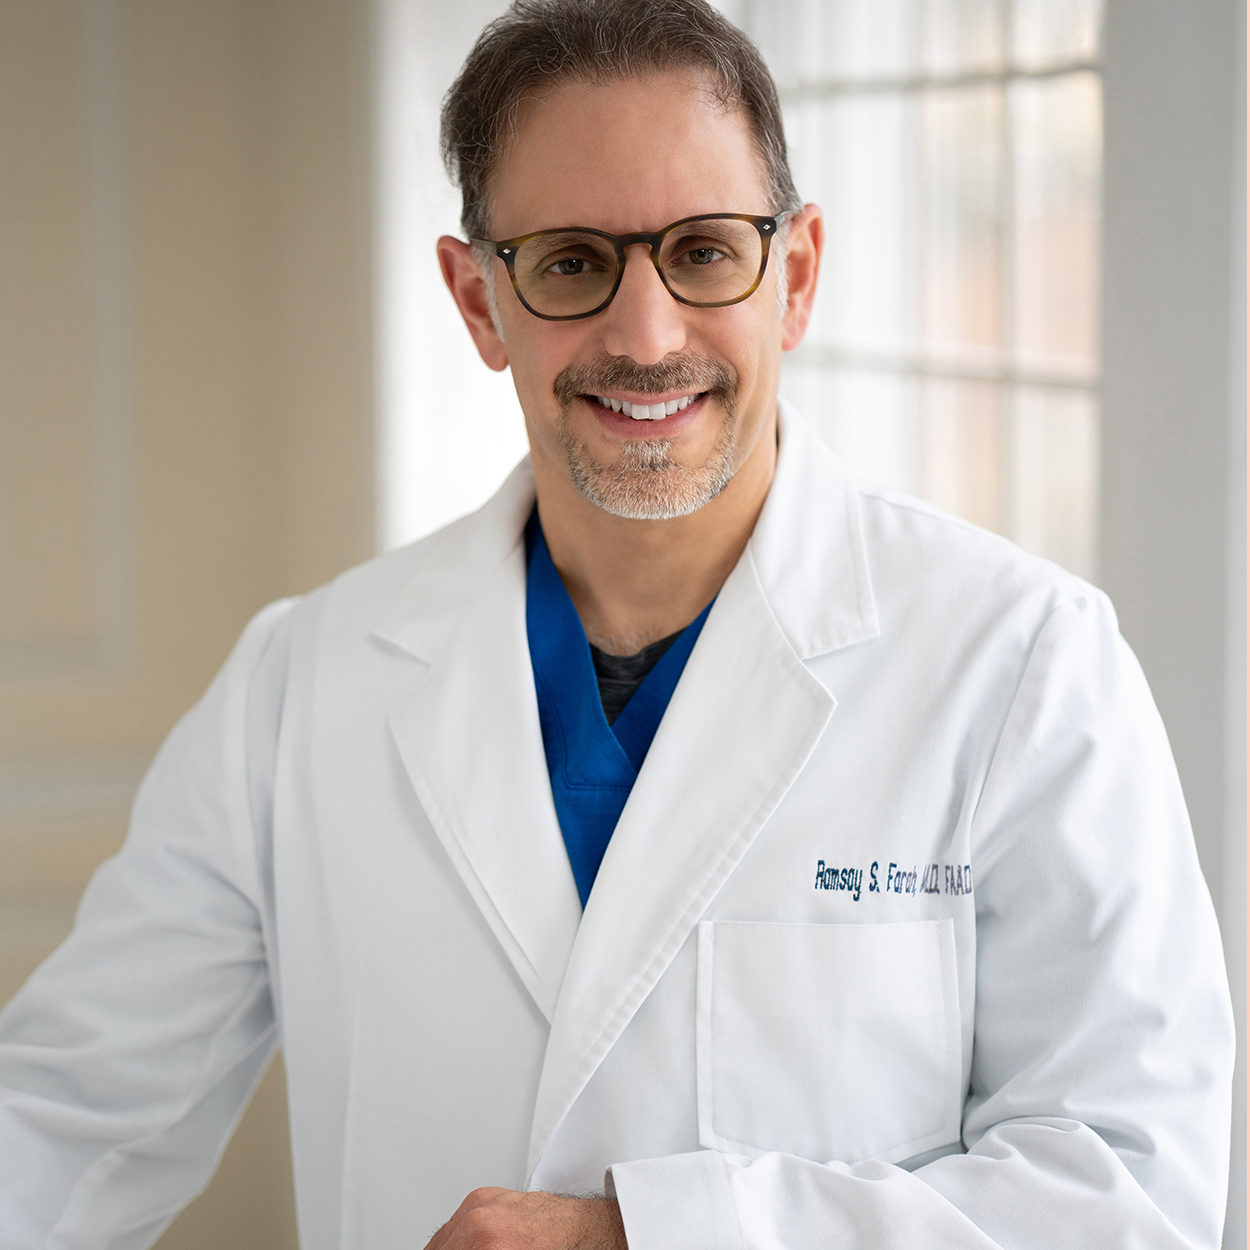 Dr. Ramsay S. Farah